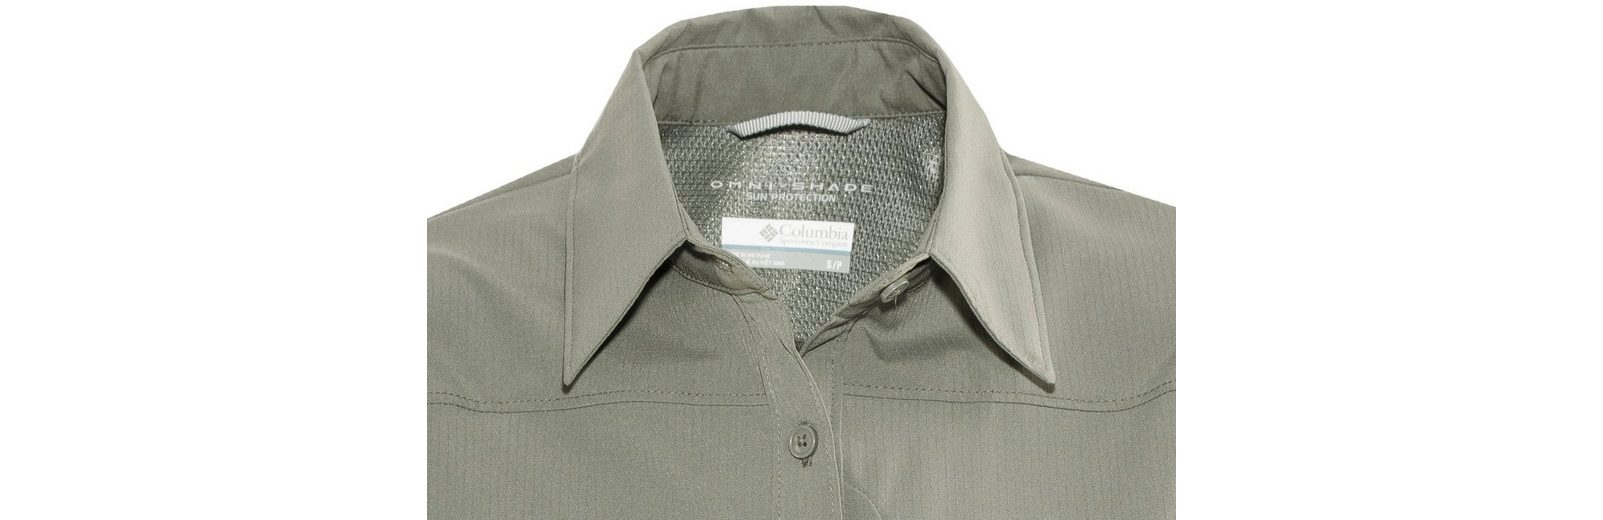 Freies Verschiffen Gutes Verkauf Mode Online-Verkauf Columbia T-Shirt Silver Ridge II Sleeveless Shirt Women Manchester Großer Verkauf Günstiger Preis pmH4TNTsbo